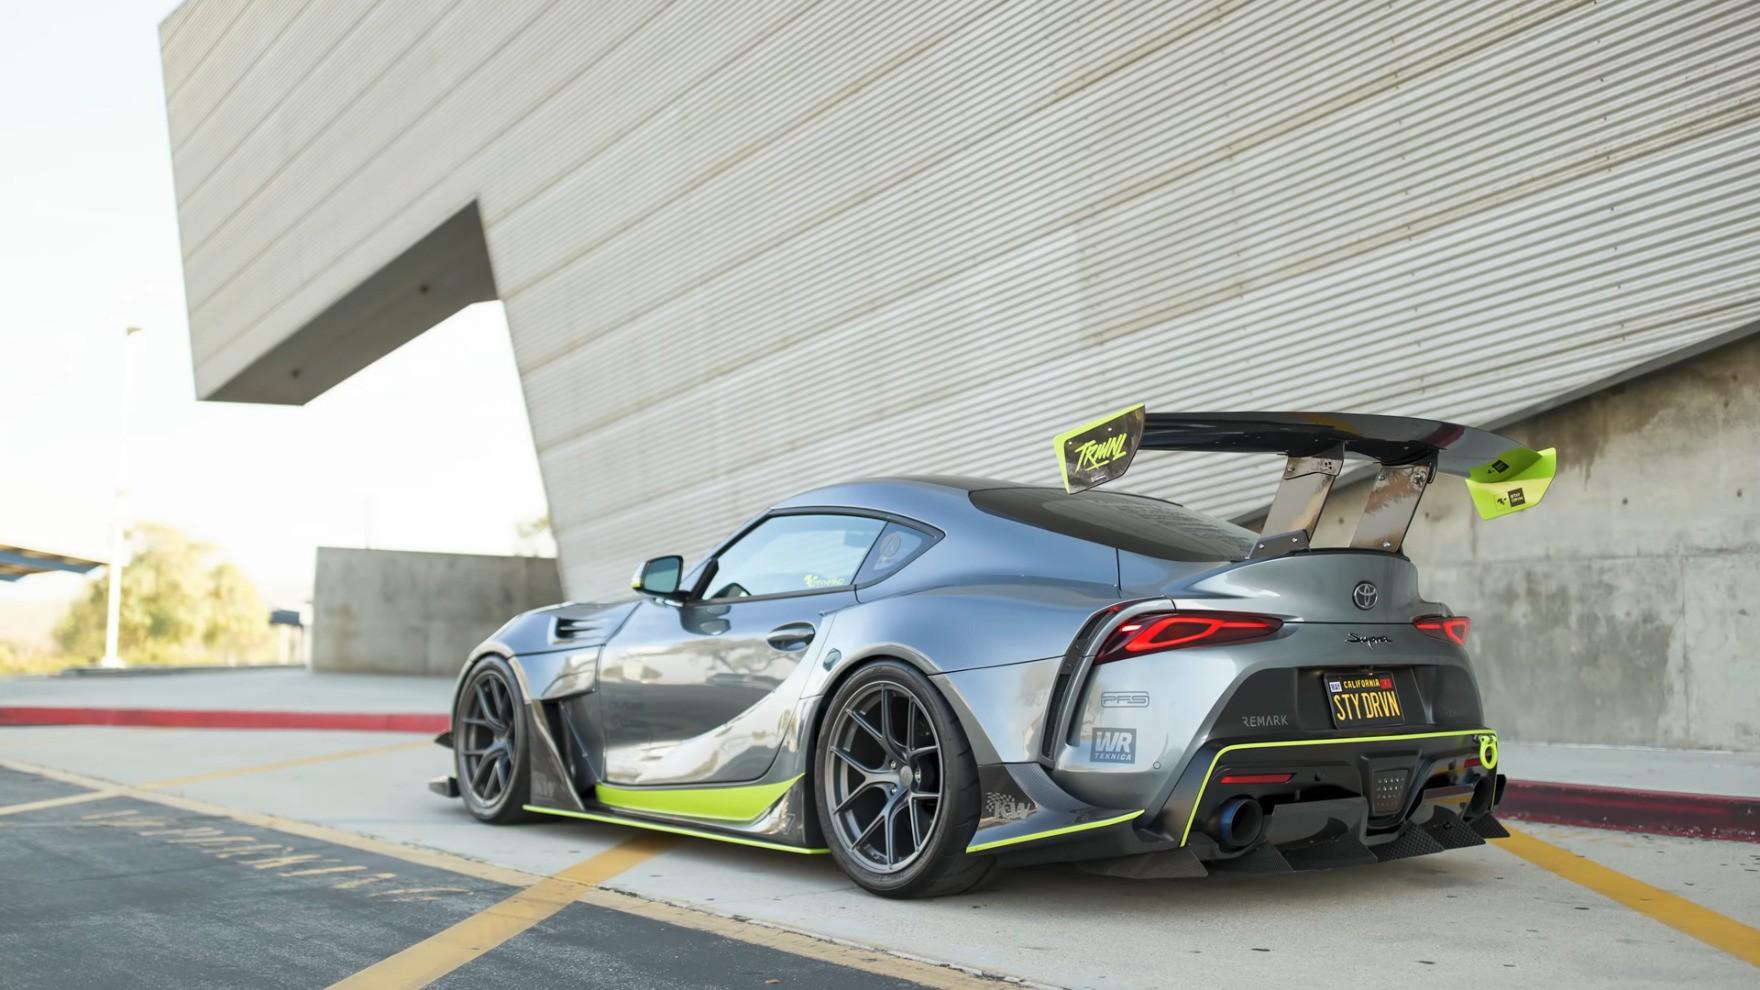 Toyota-Supra-by-Varis-5